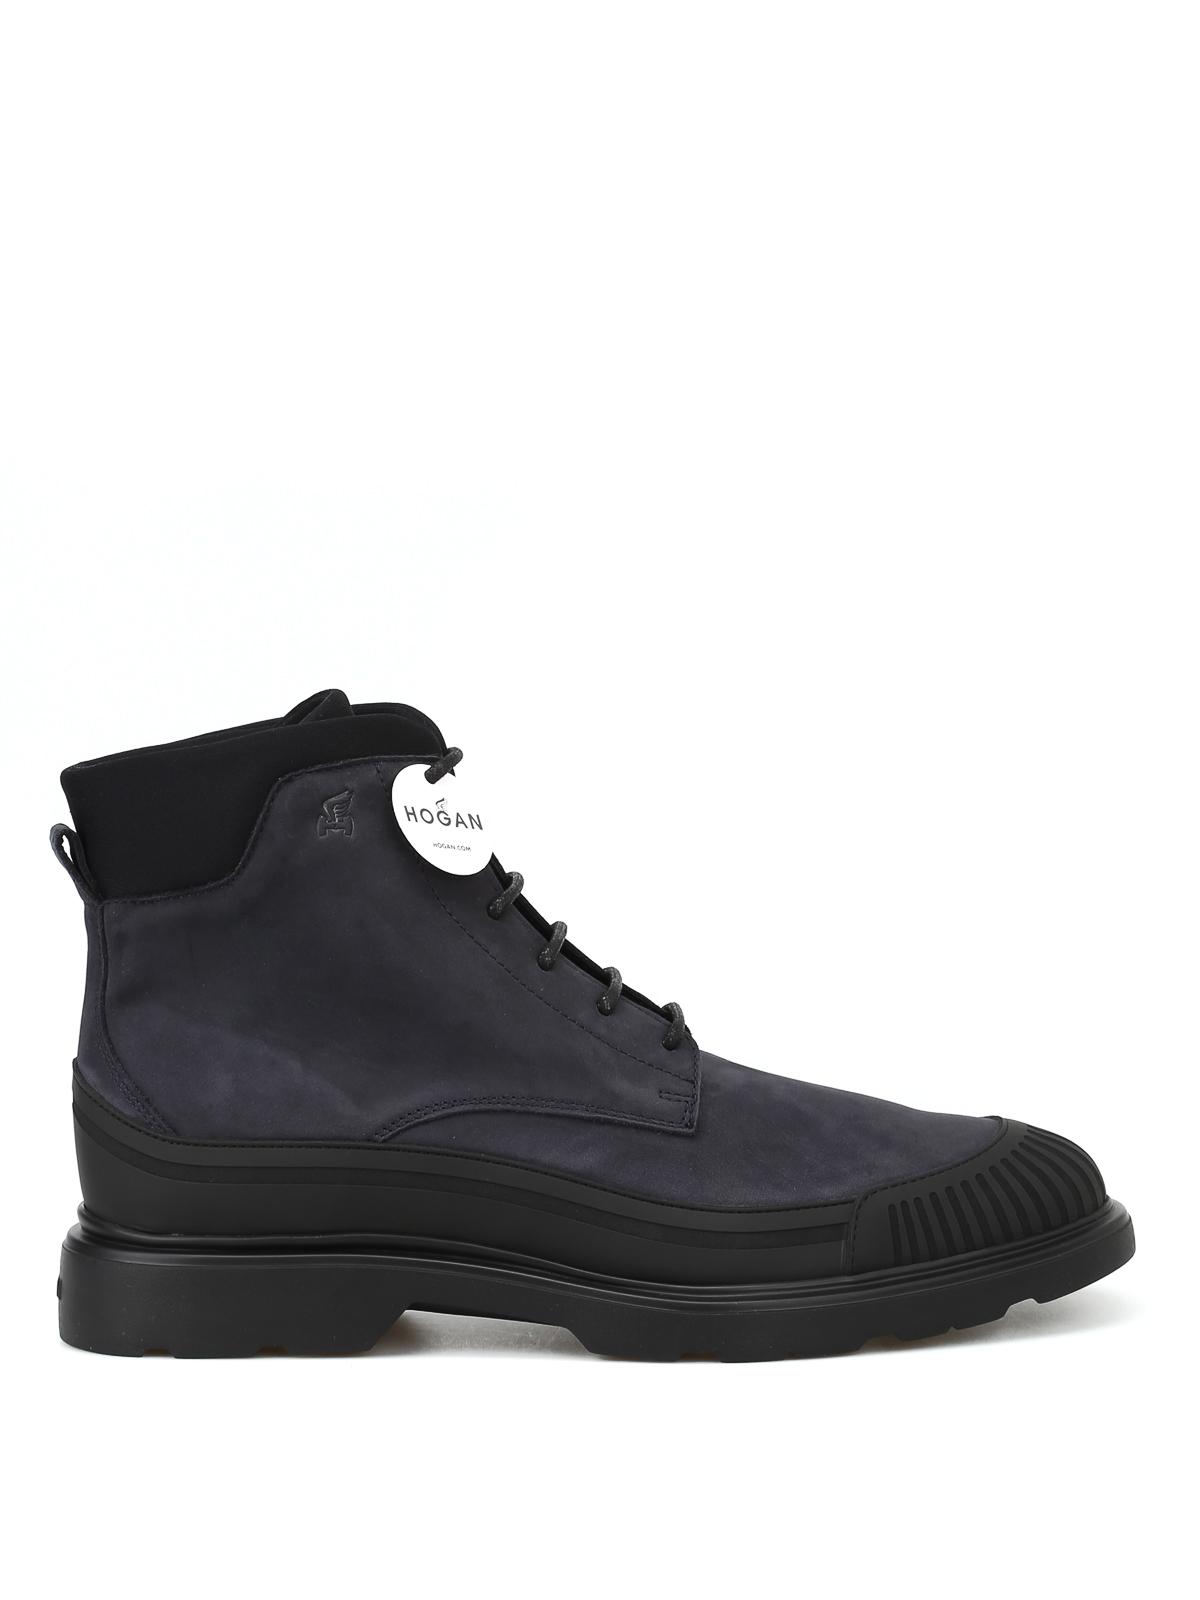 Ankle boots Hogan - Charcoal nubuck combat boots - HXM3930AV00JPT57R2